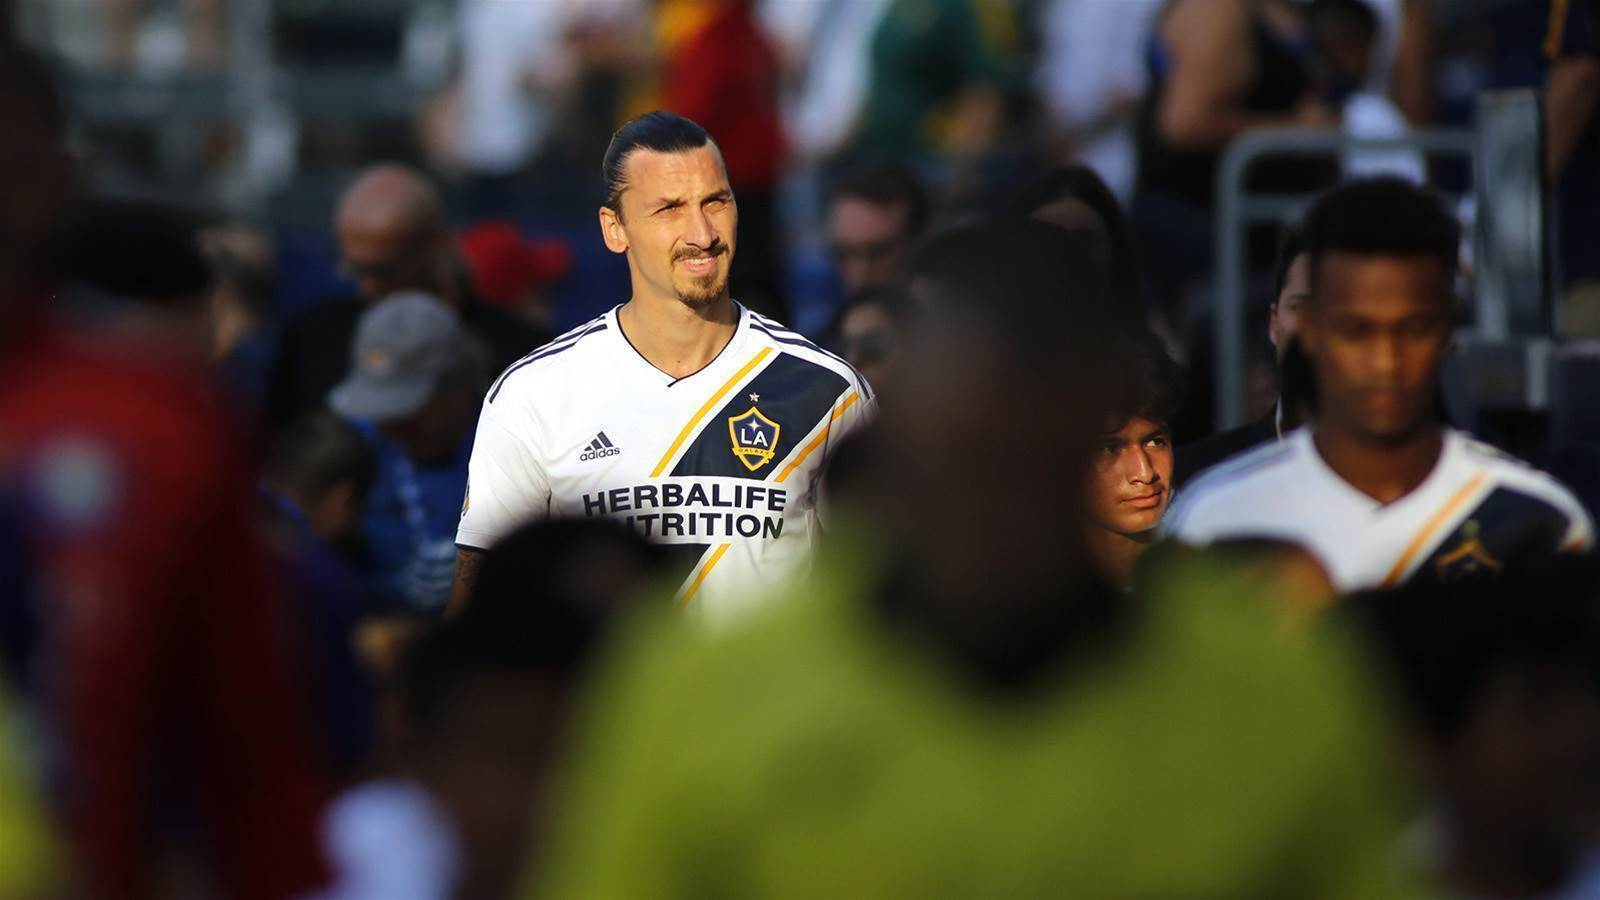 'Now sign a superstar like Zlatan!'